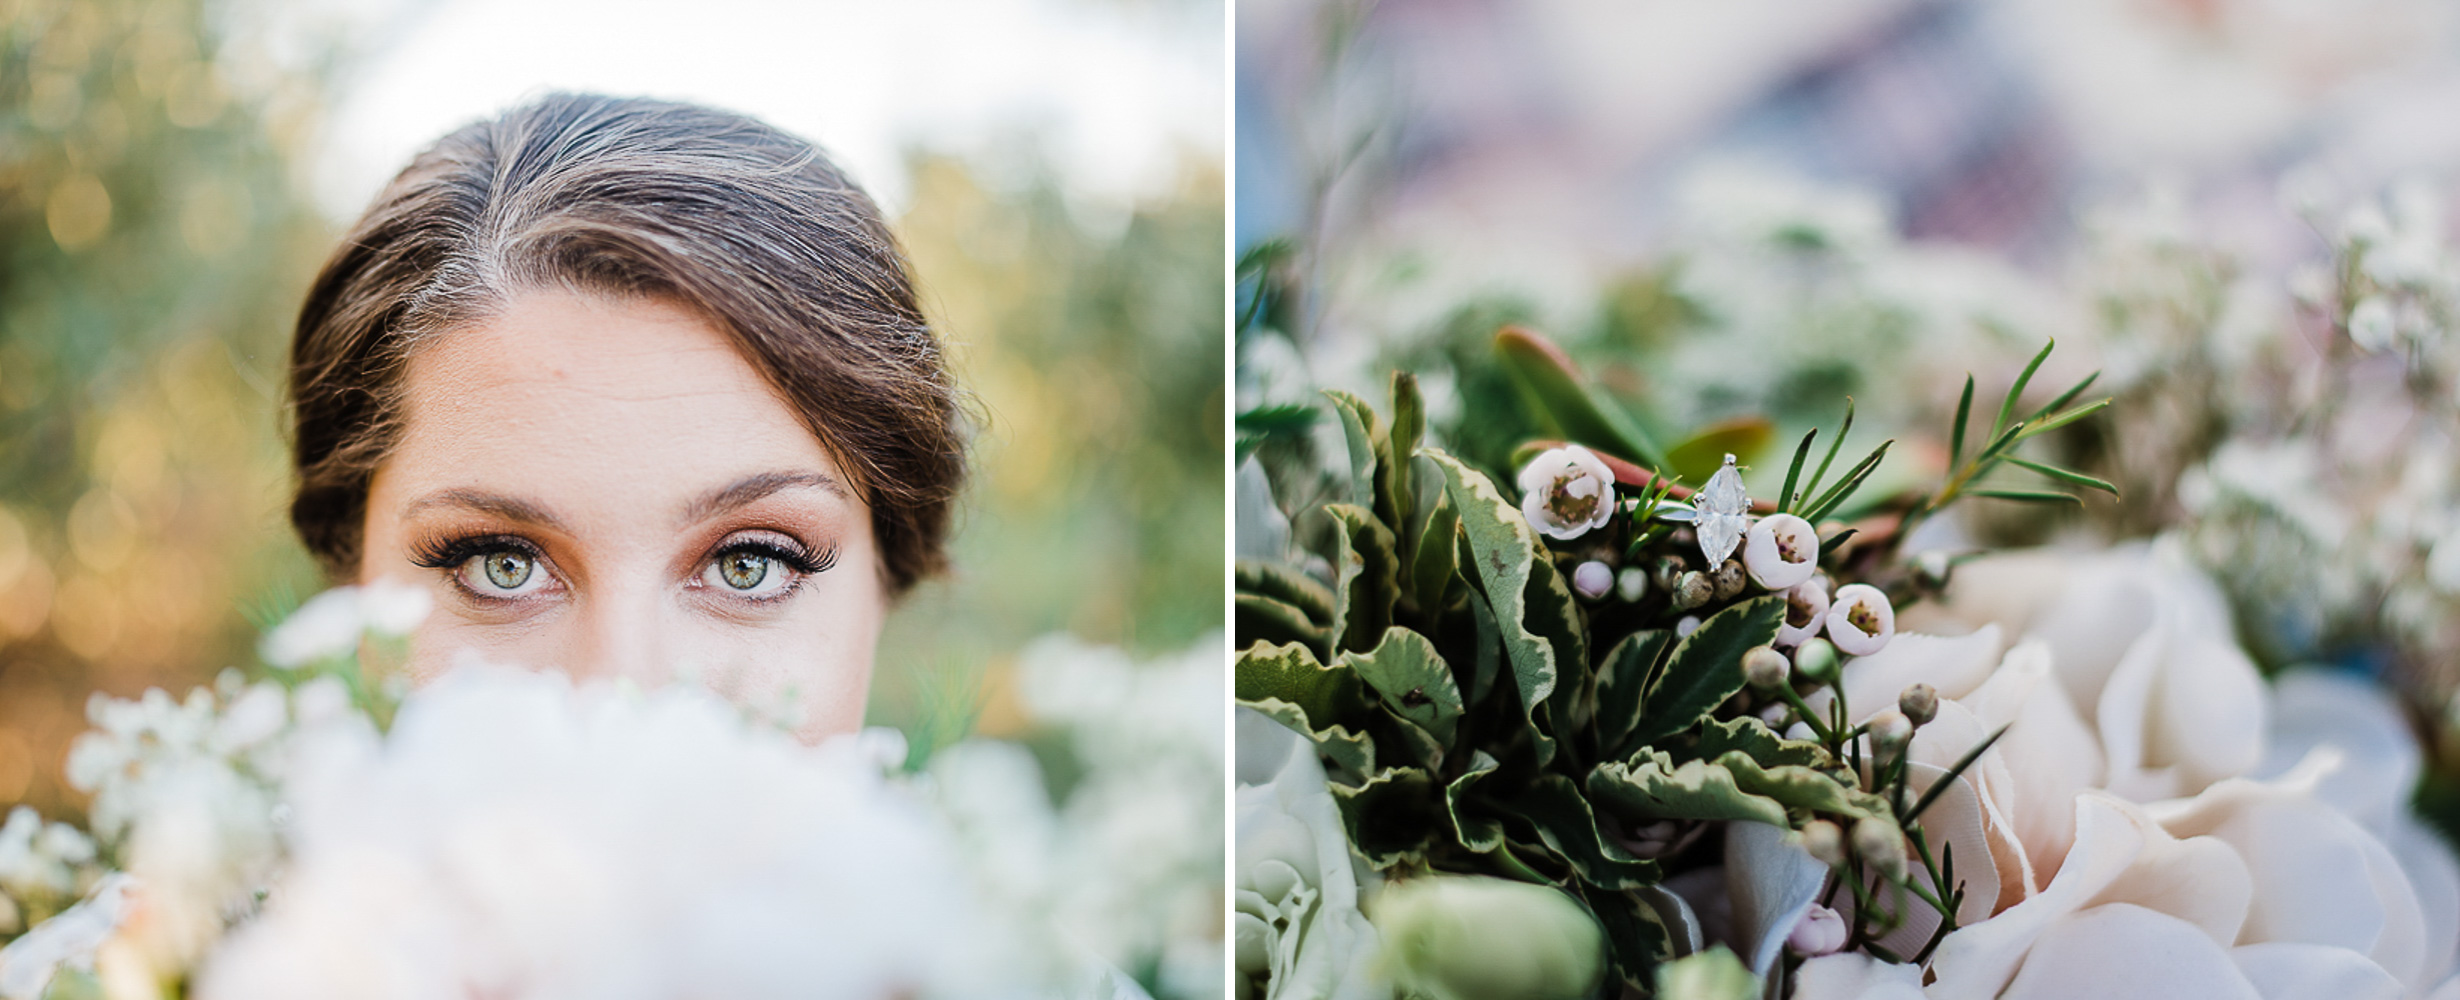 Bridal Portraits, Mountain, succulent, vineyard Bridal, 15.jpg